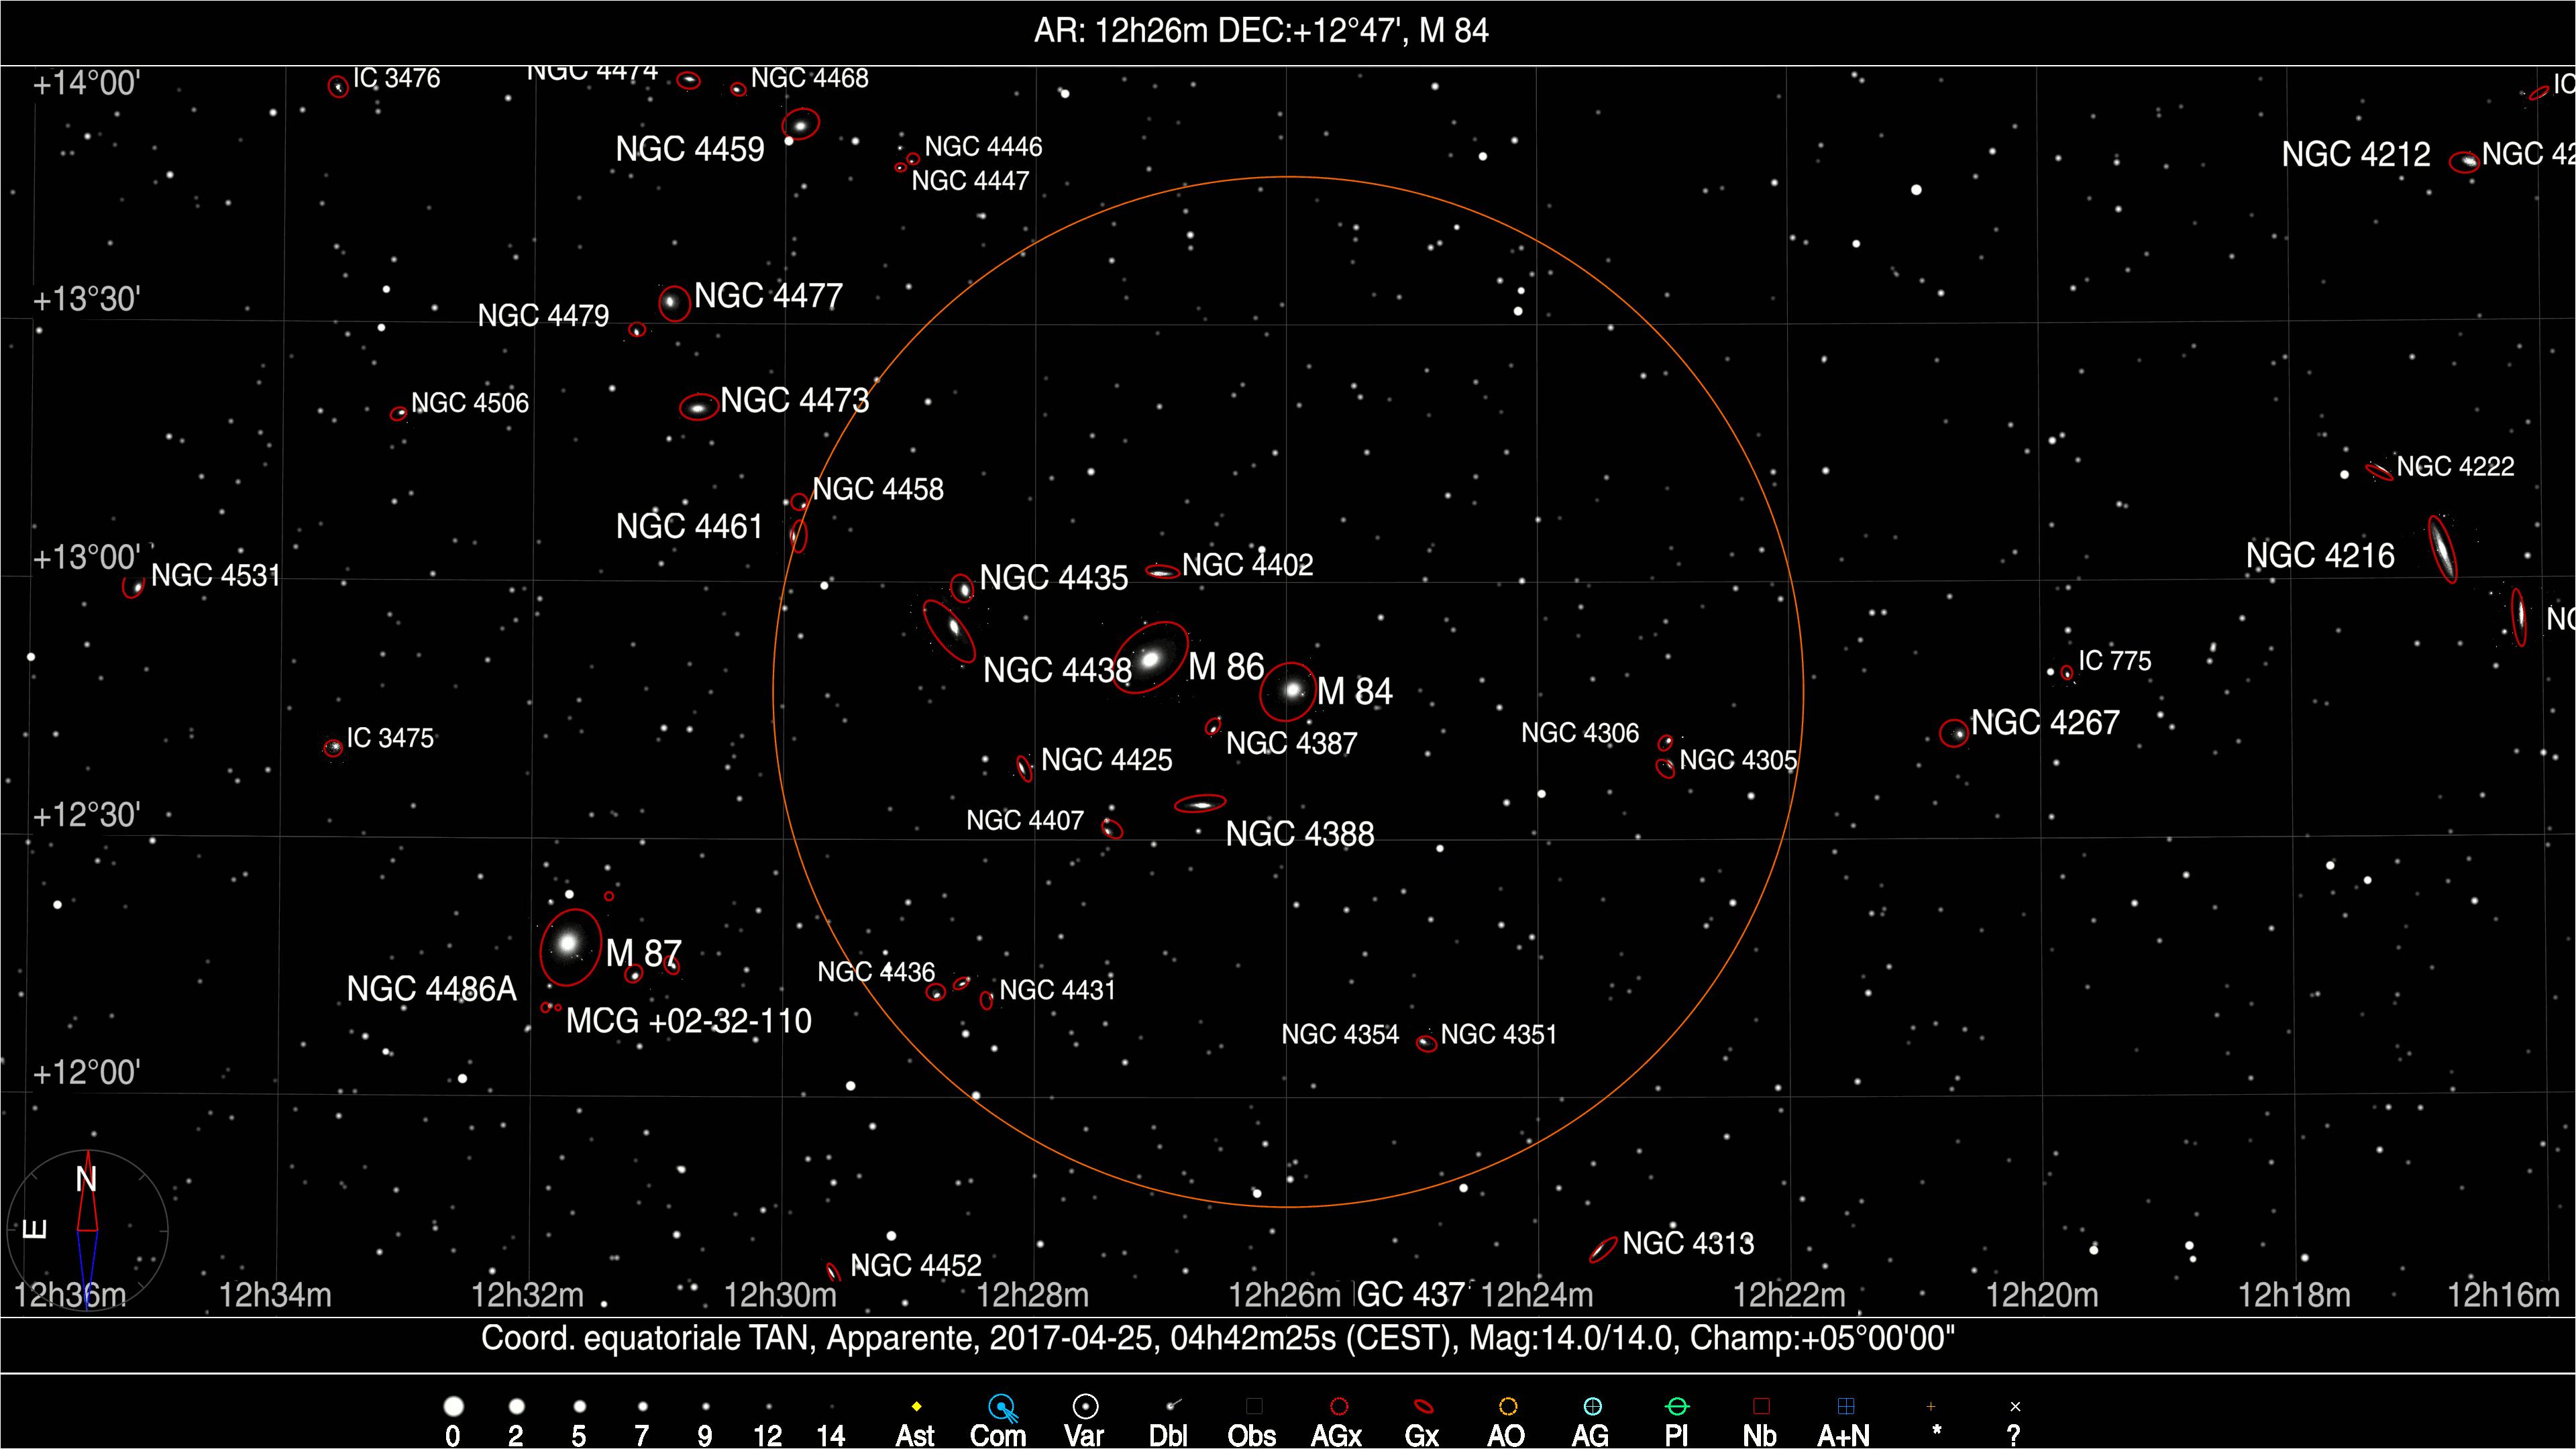 M84_5